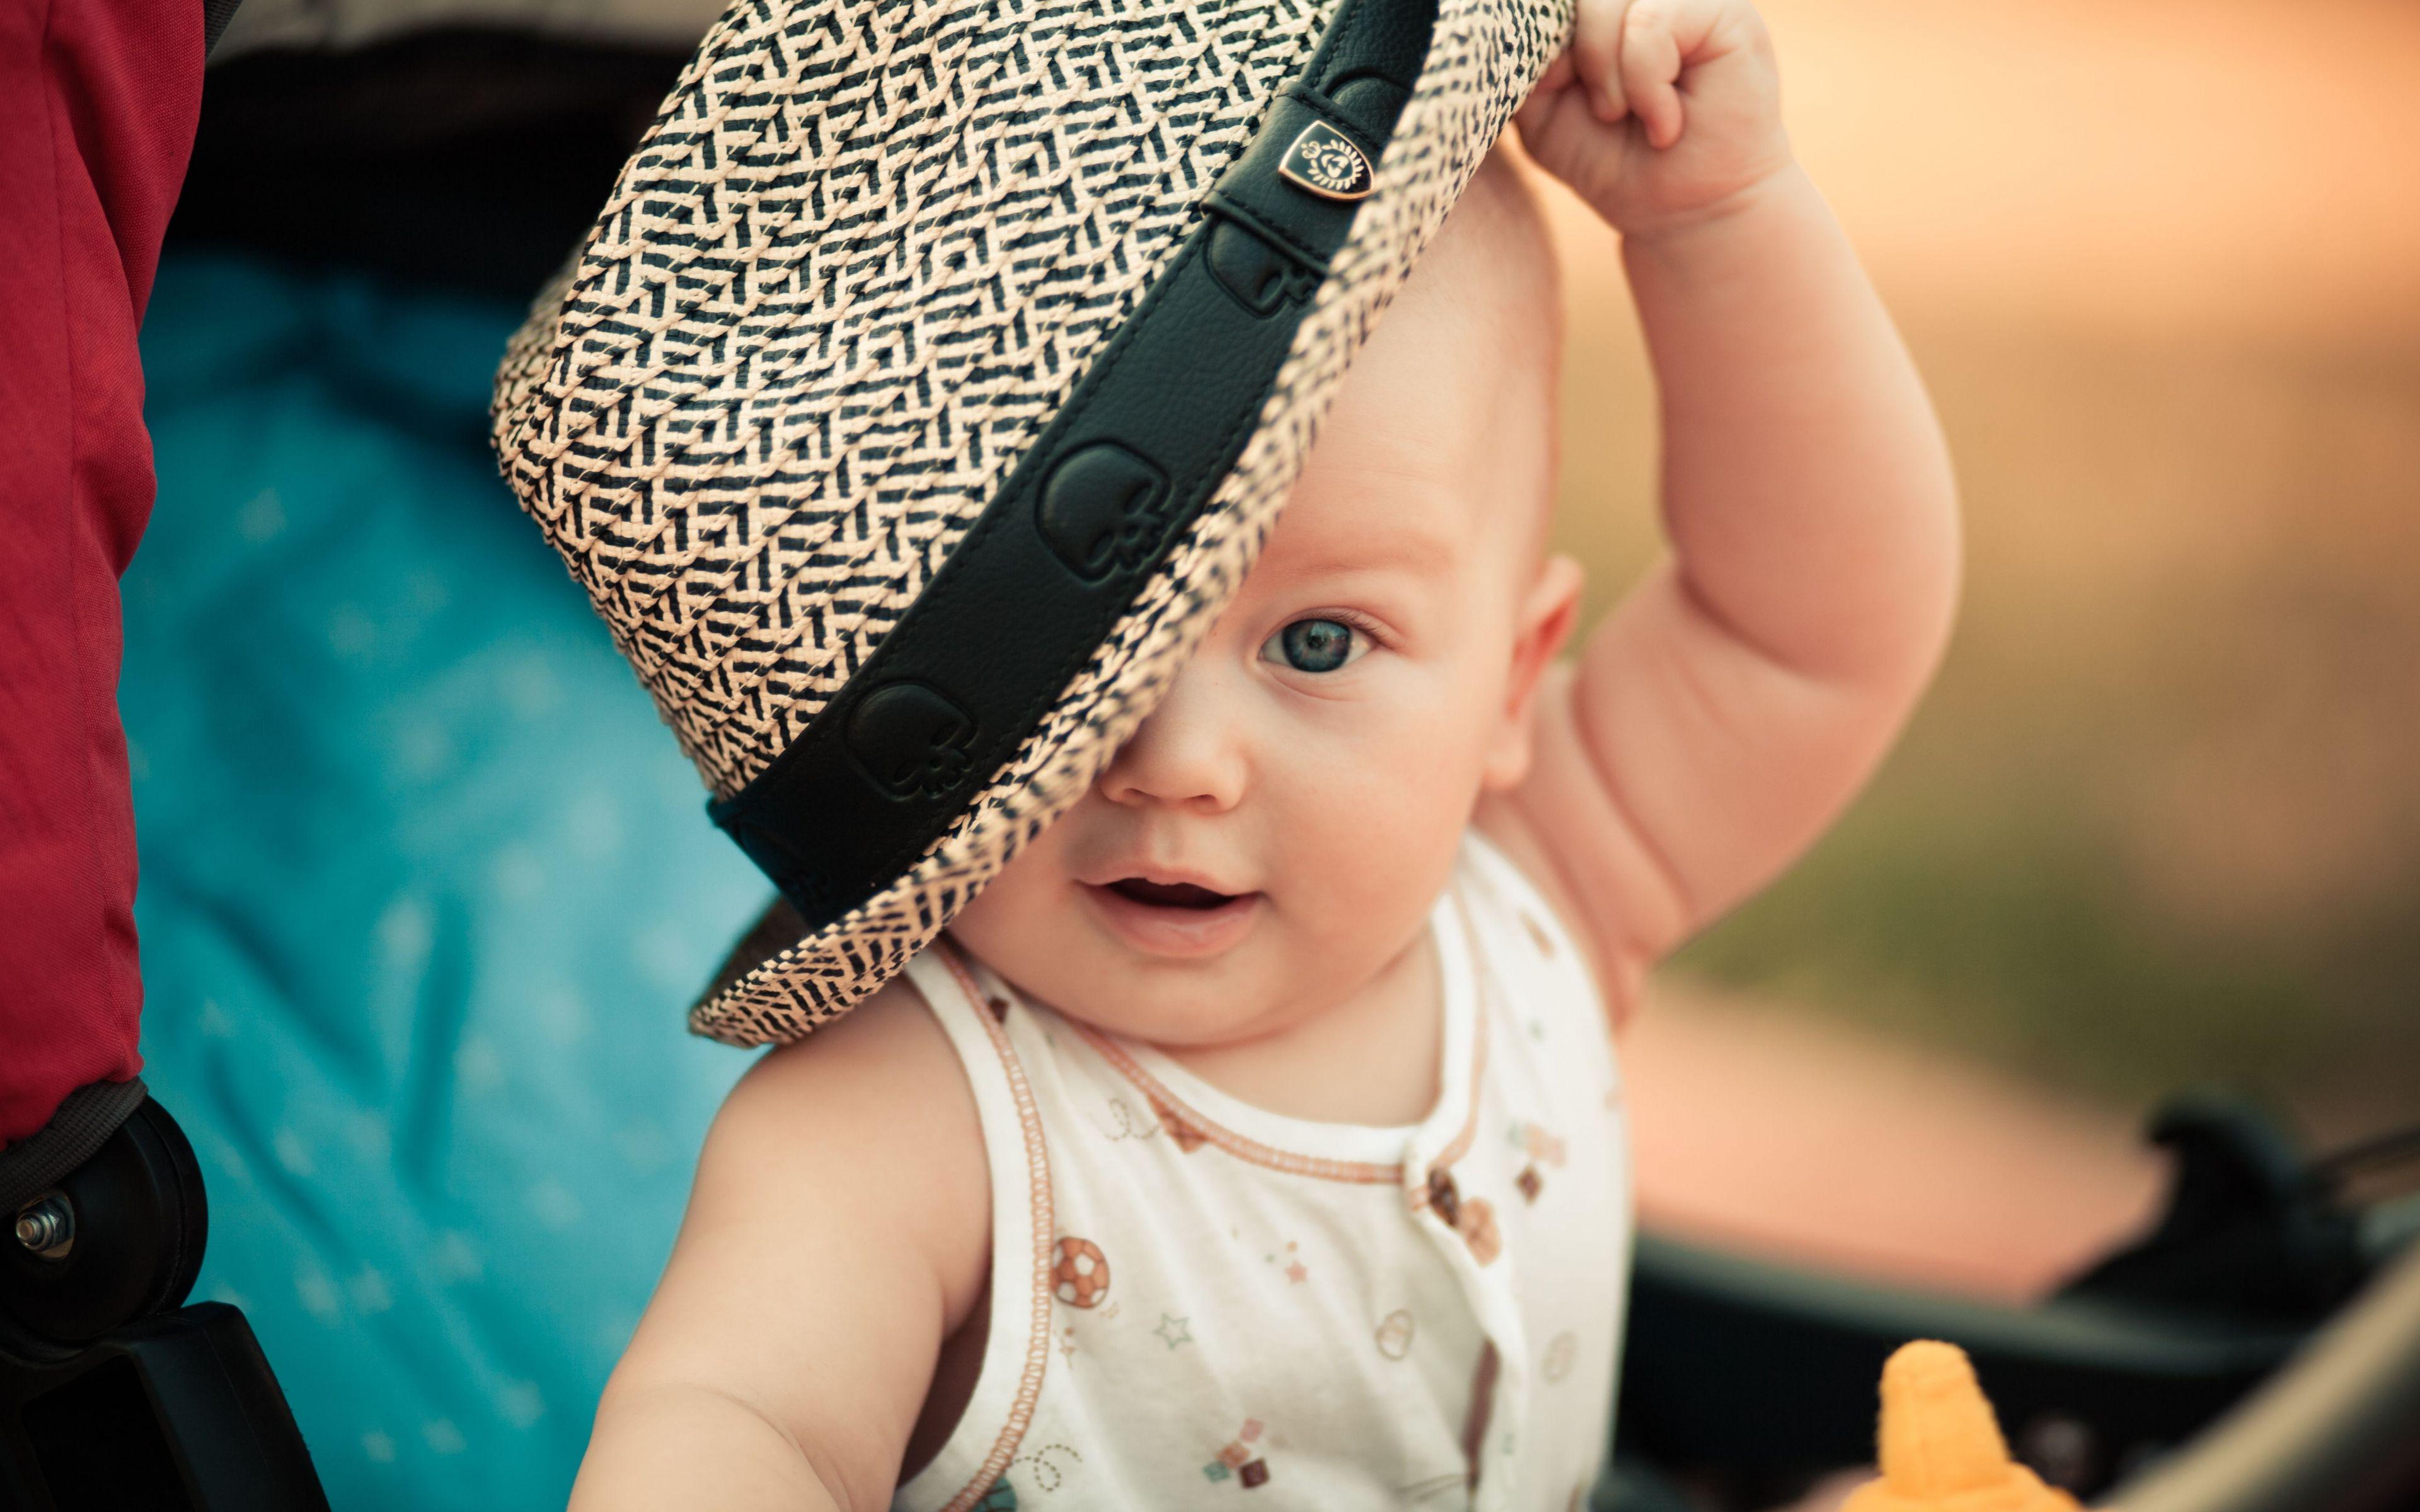 Ultra Hdbaby Hd Of Muslim Babies For Cute Baby Wallpaper Cute Boy Wallpaper Baby Girl Wallpaper